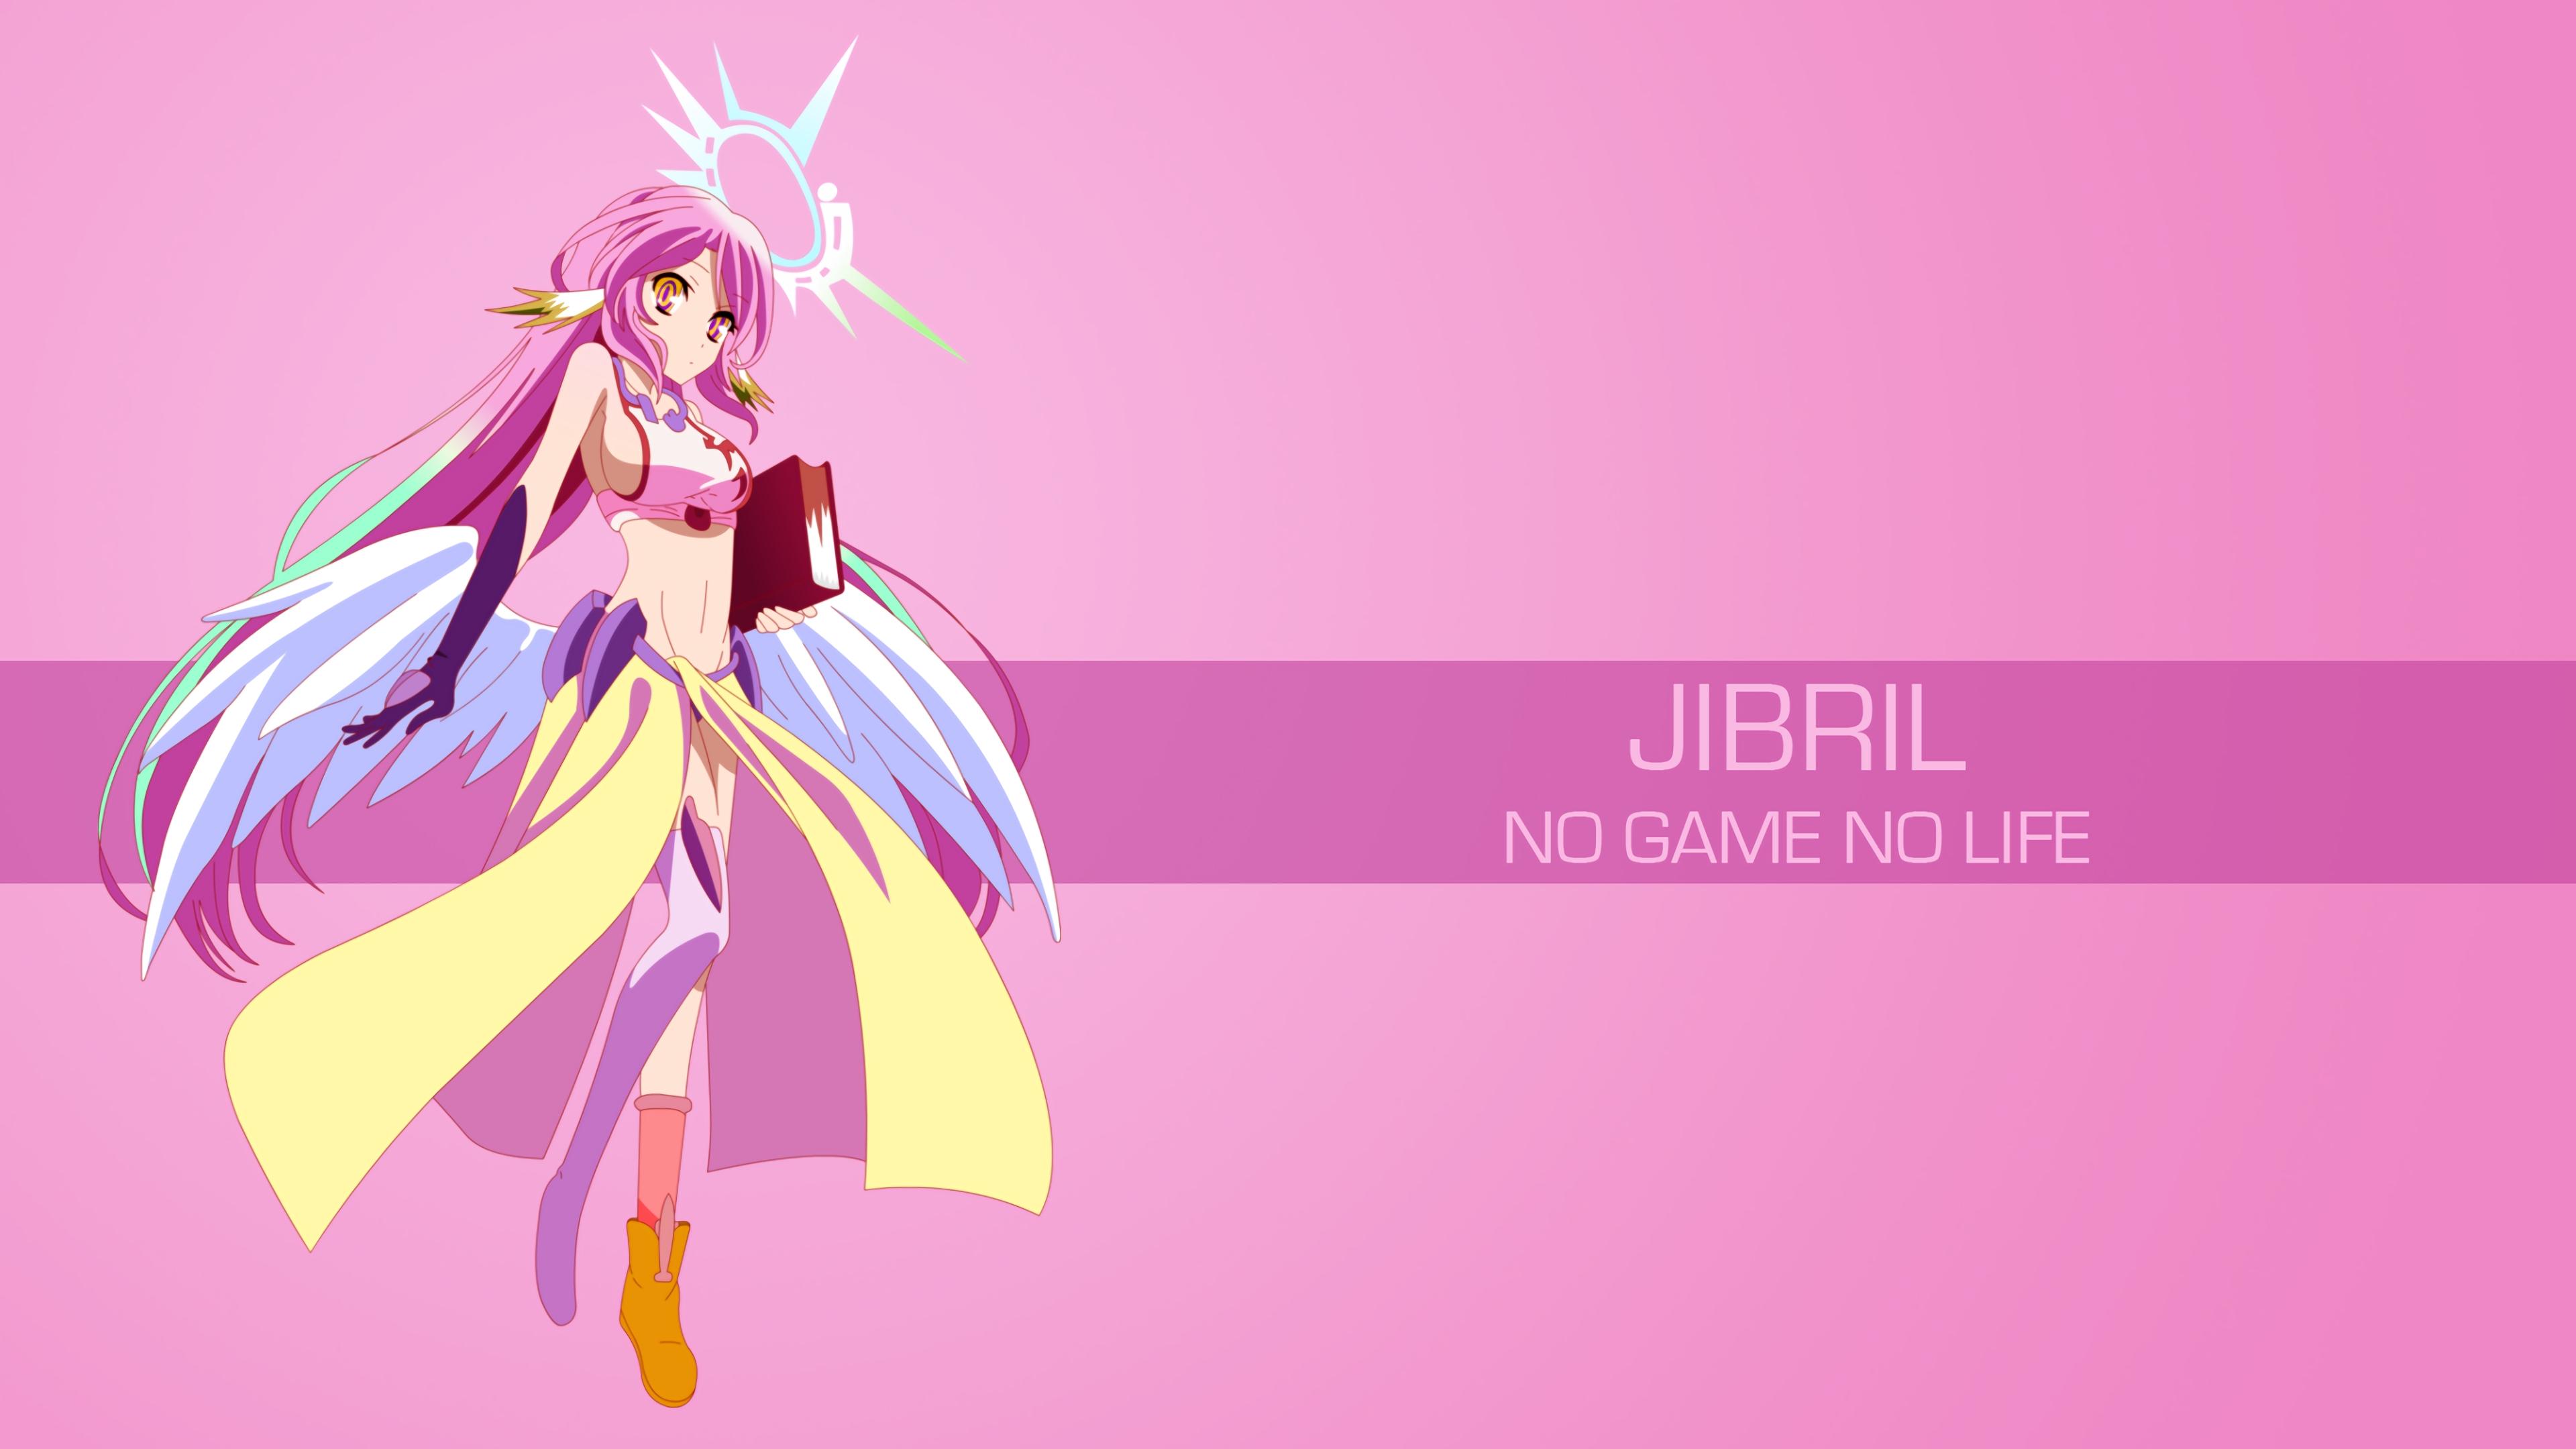 Jibril No Game No Life Hd Wallpaper 2051164 Zerochan Anime